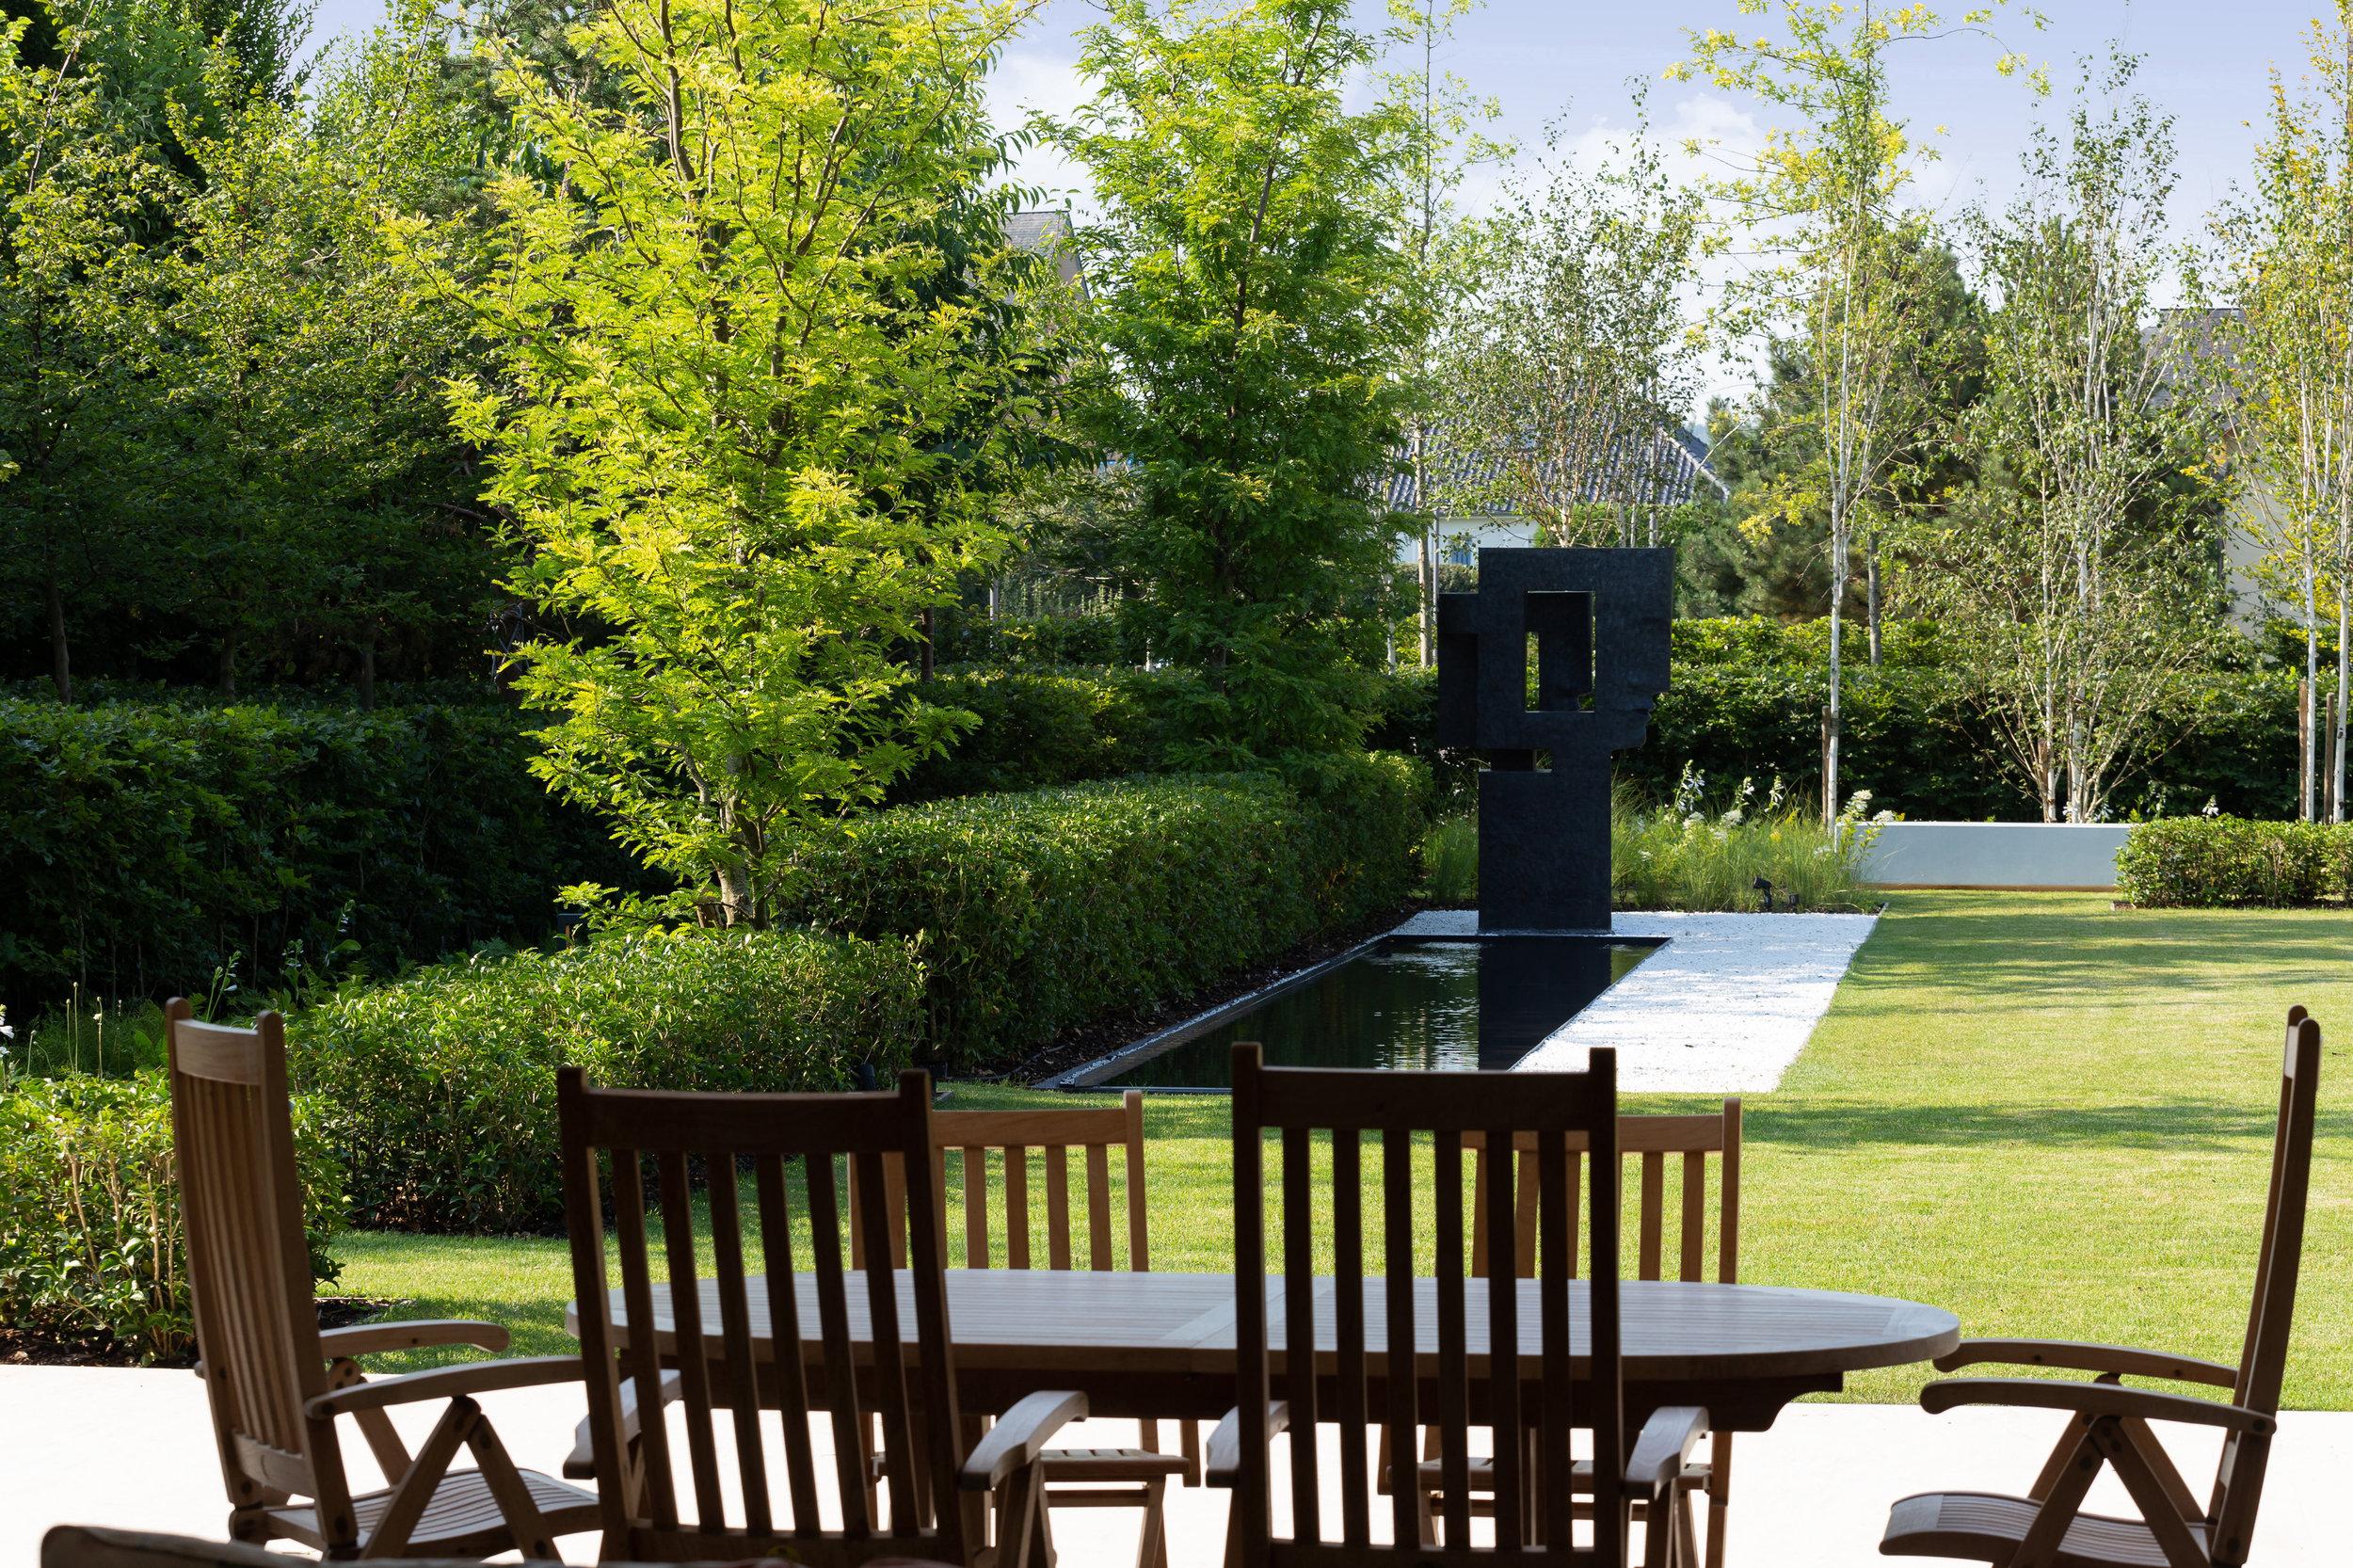 luxembourg_terraces_gardens_outdoor_landscape_designer_christophe_gautrand_7.jpg